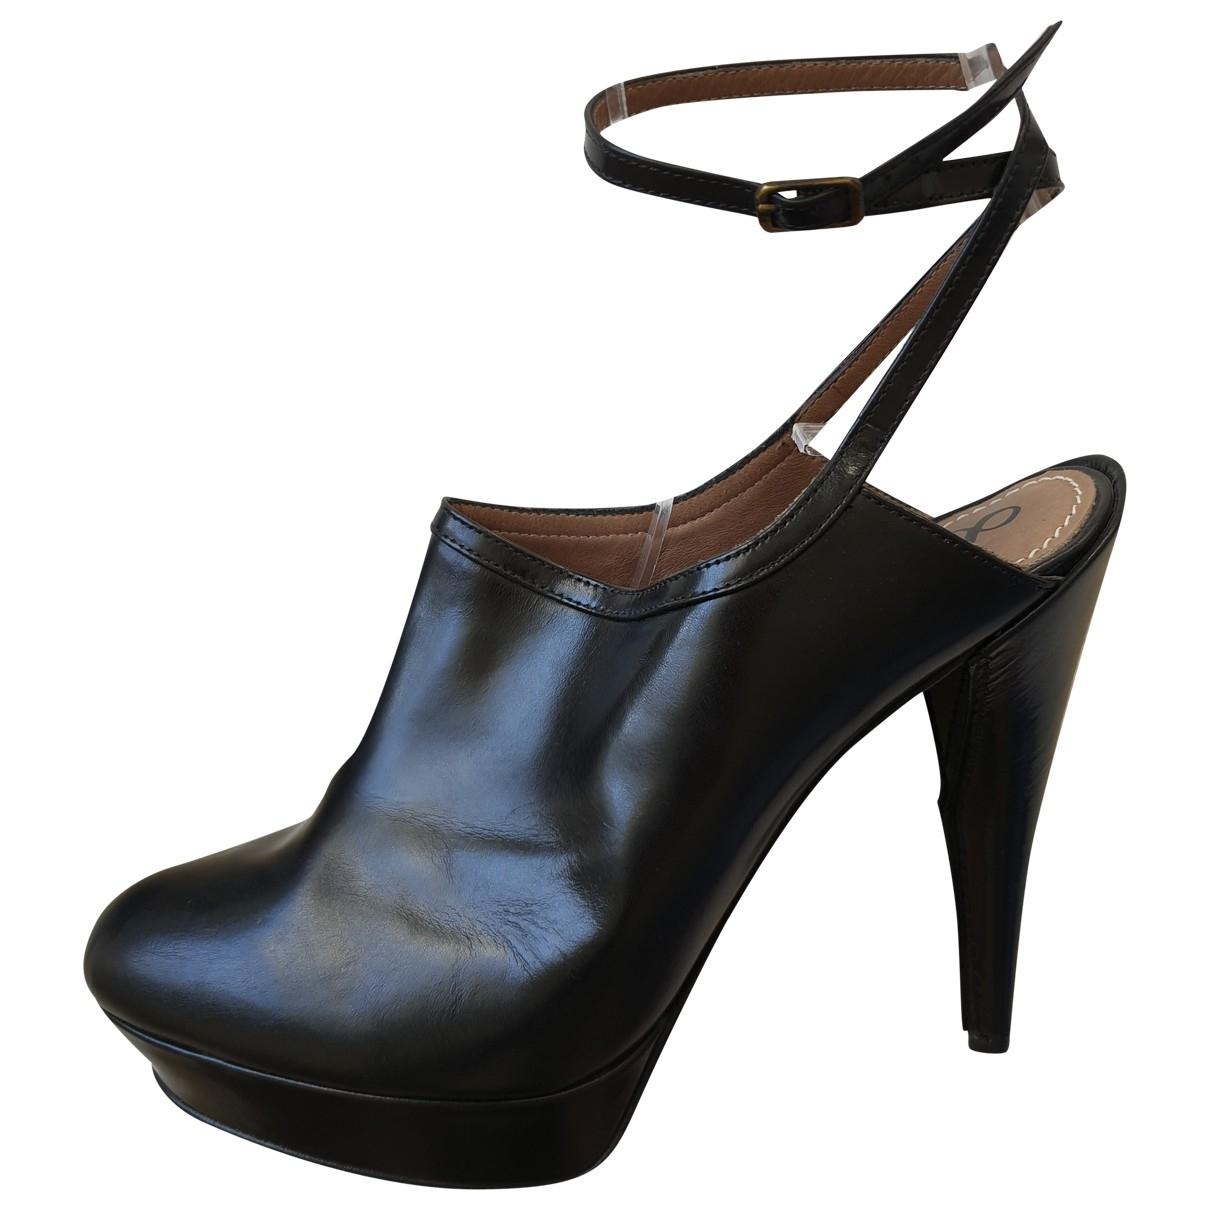 Lanvin \N Stiefeletten in  Schwarz Leder